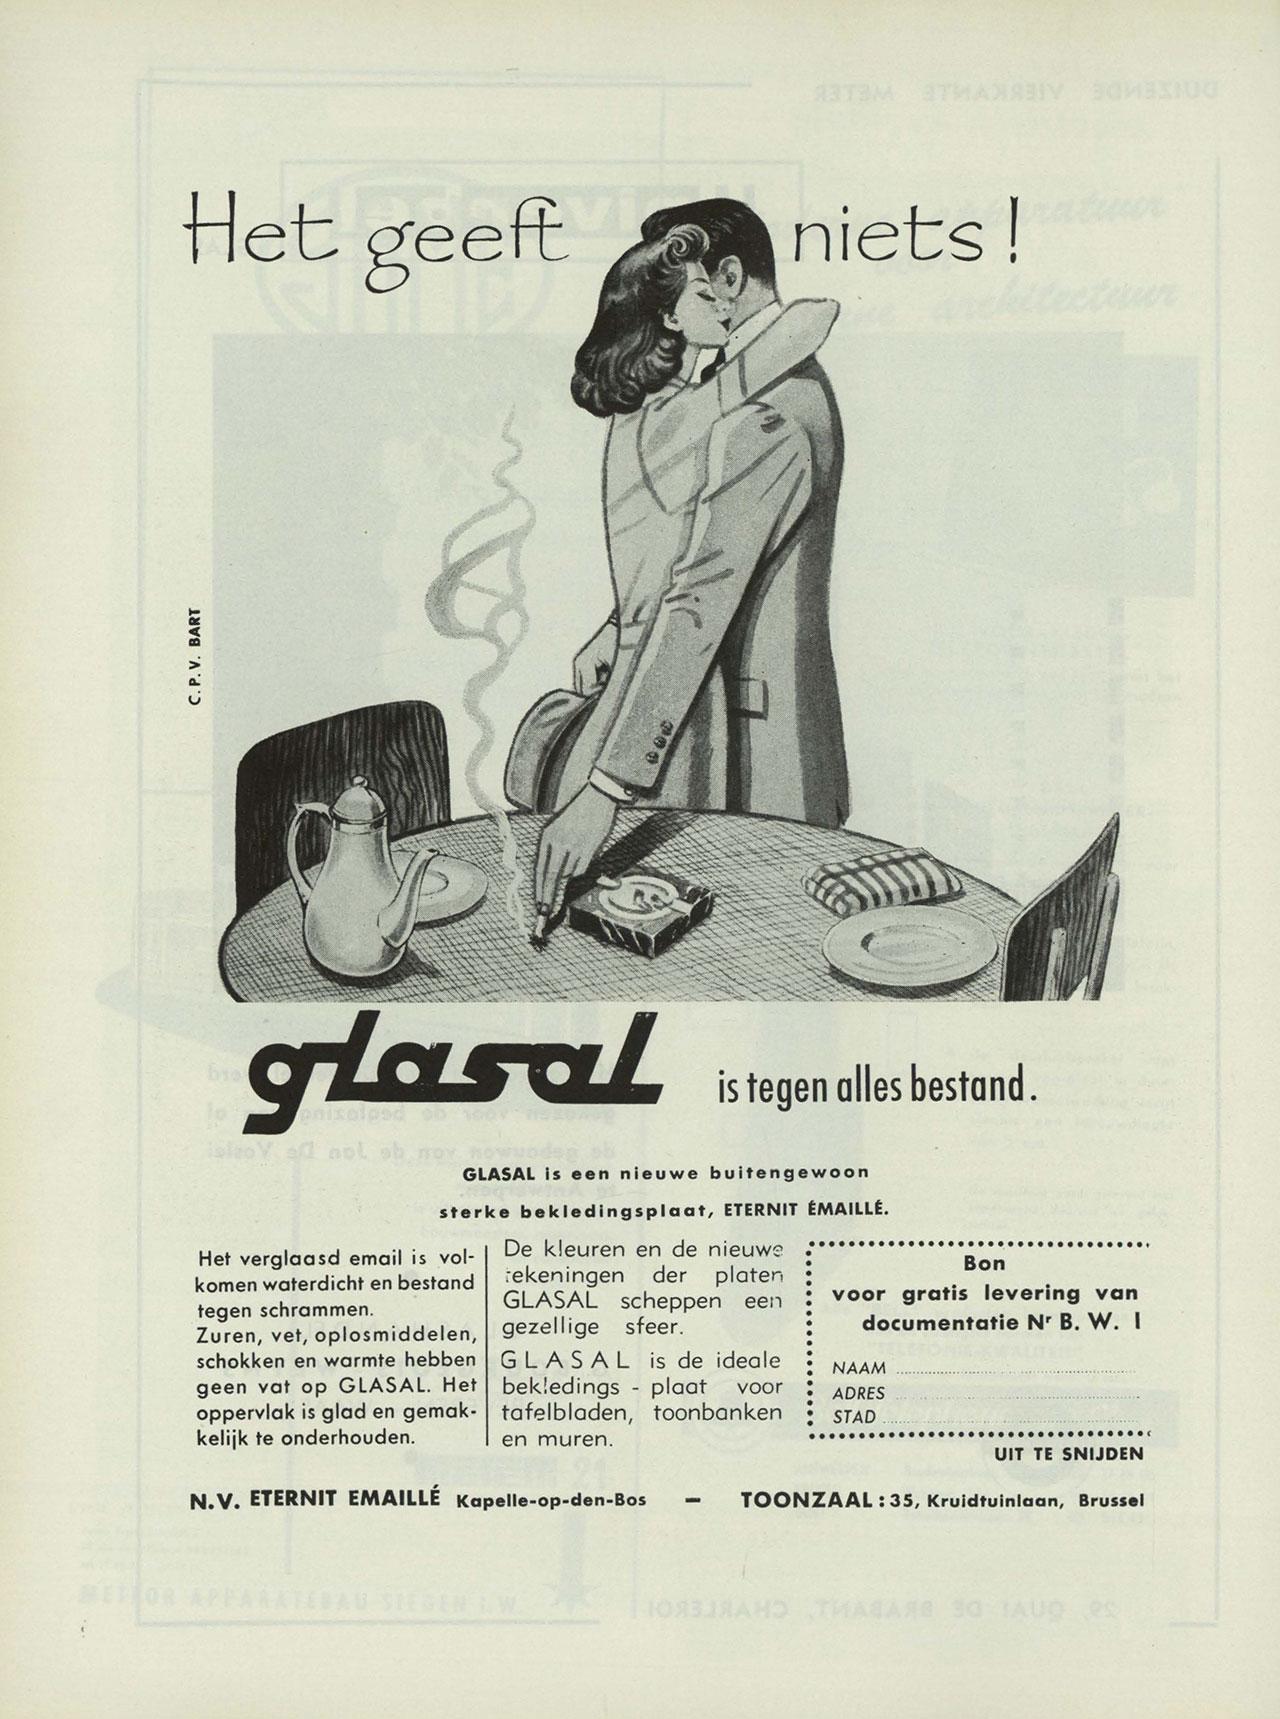 Glasal